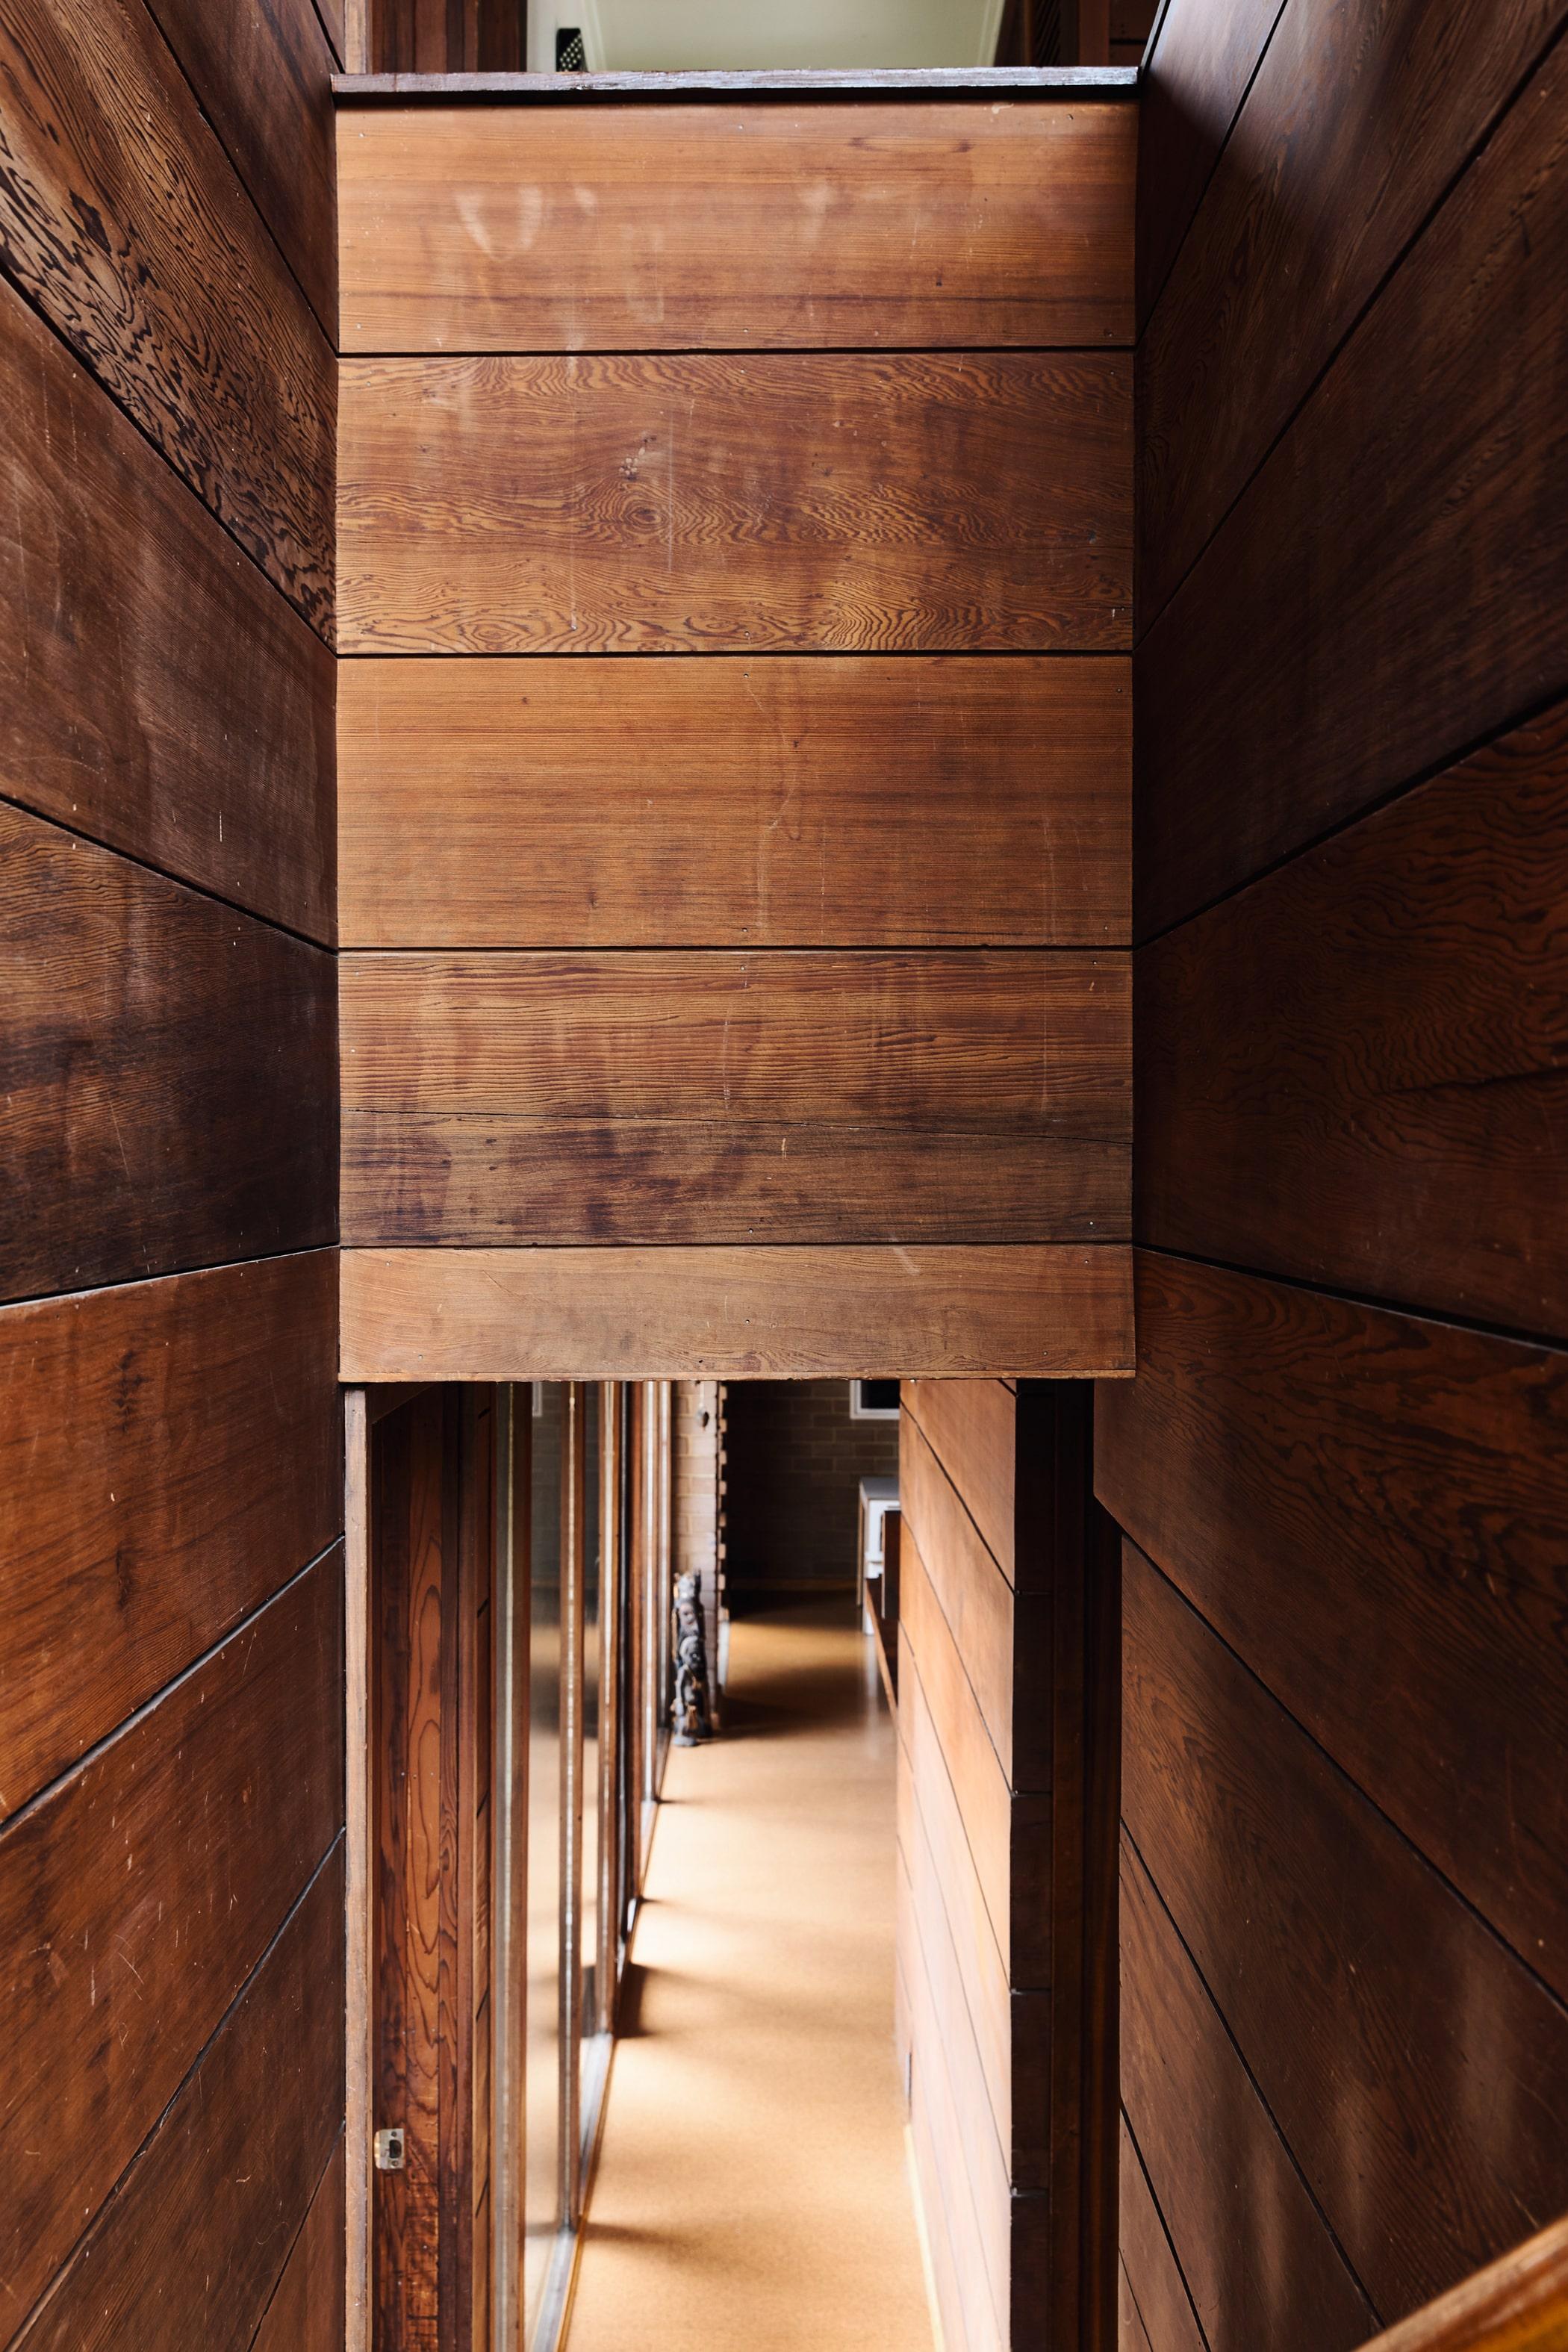 Gallery Of The Godsell House By David Godsell Local Australian Mid Century Modern Architecture Beaumaris, Vic Image 9